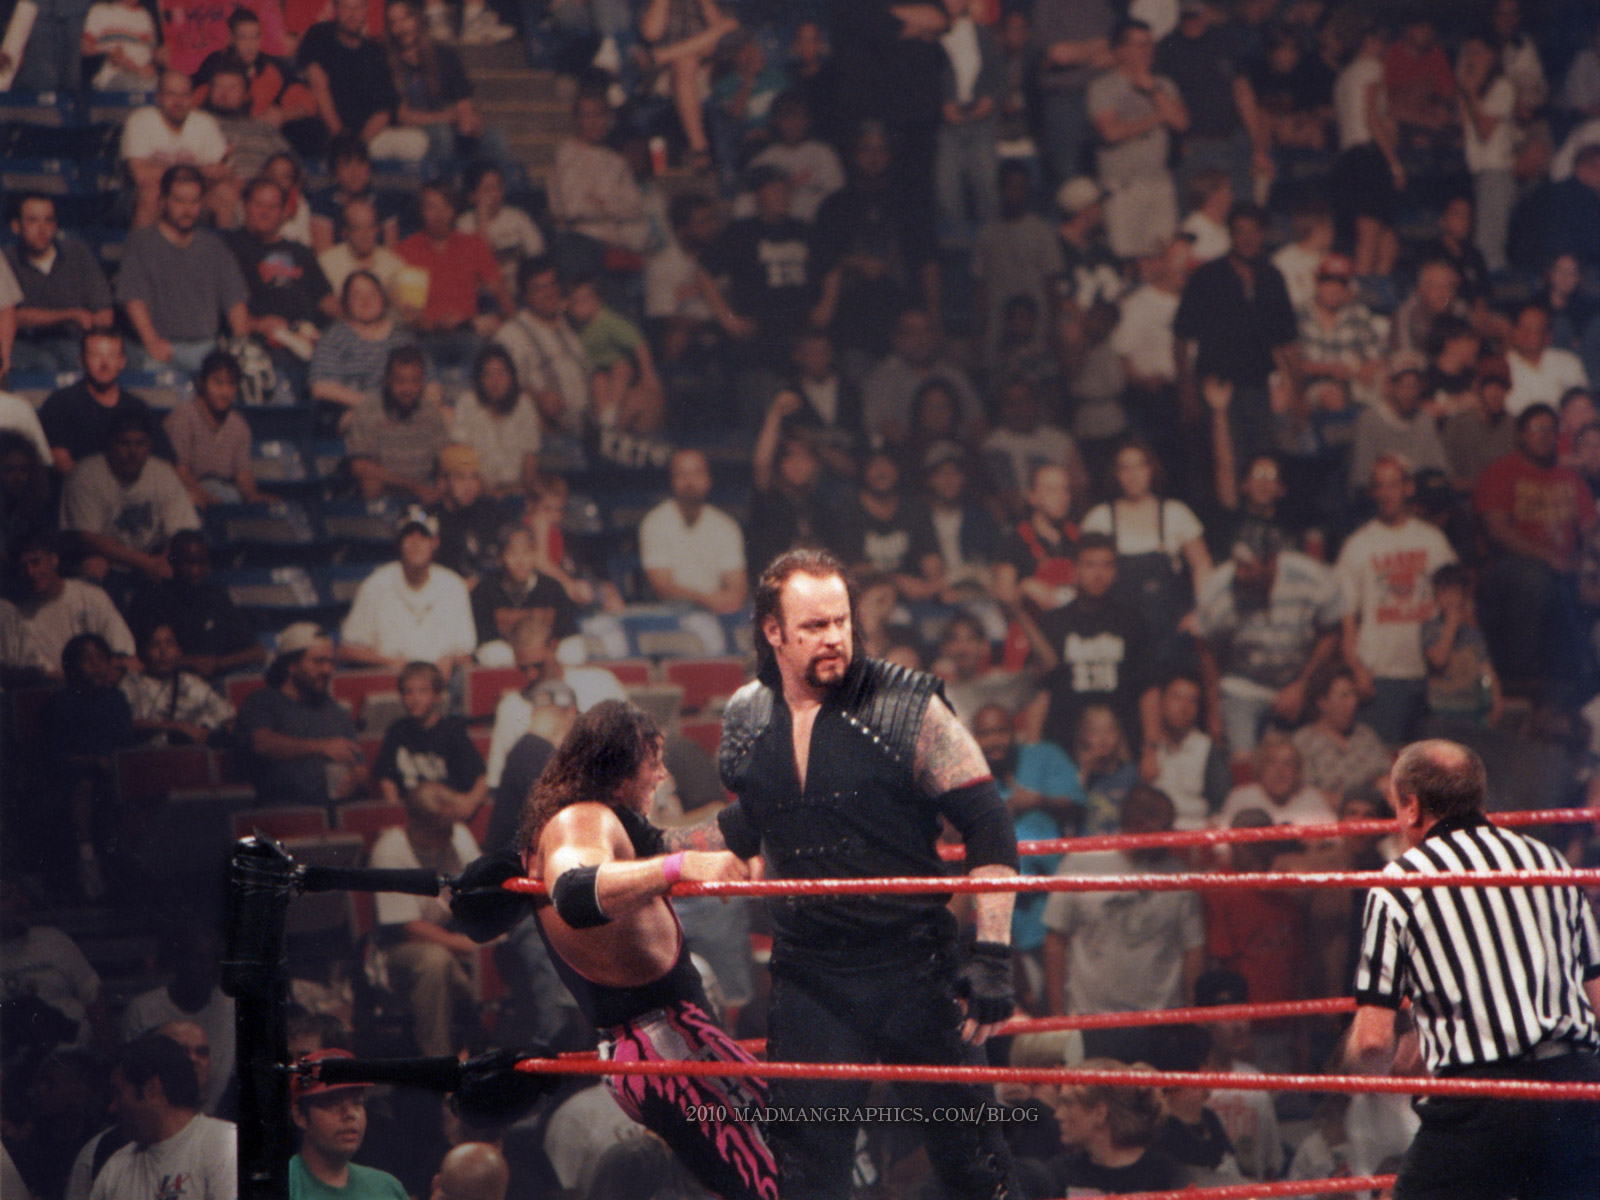 Free Wallpaper Undertaker 1997 Dan Poynters MadMania